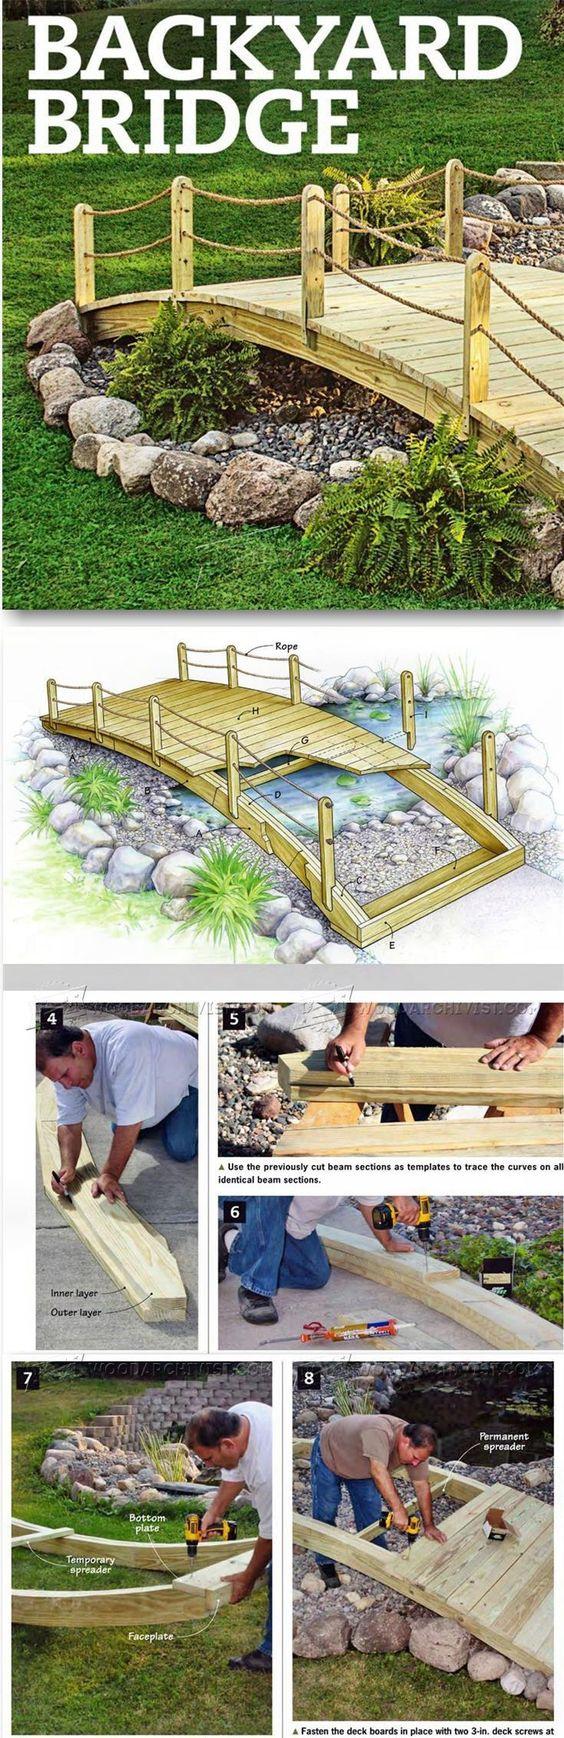 Backyard Bridge Plans - Outdoor Plans and Projects | WoodArchivist.com